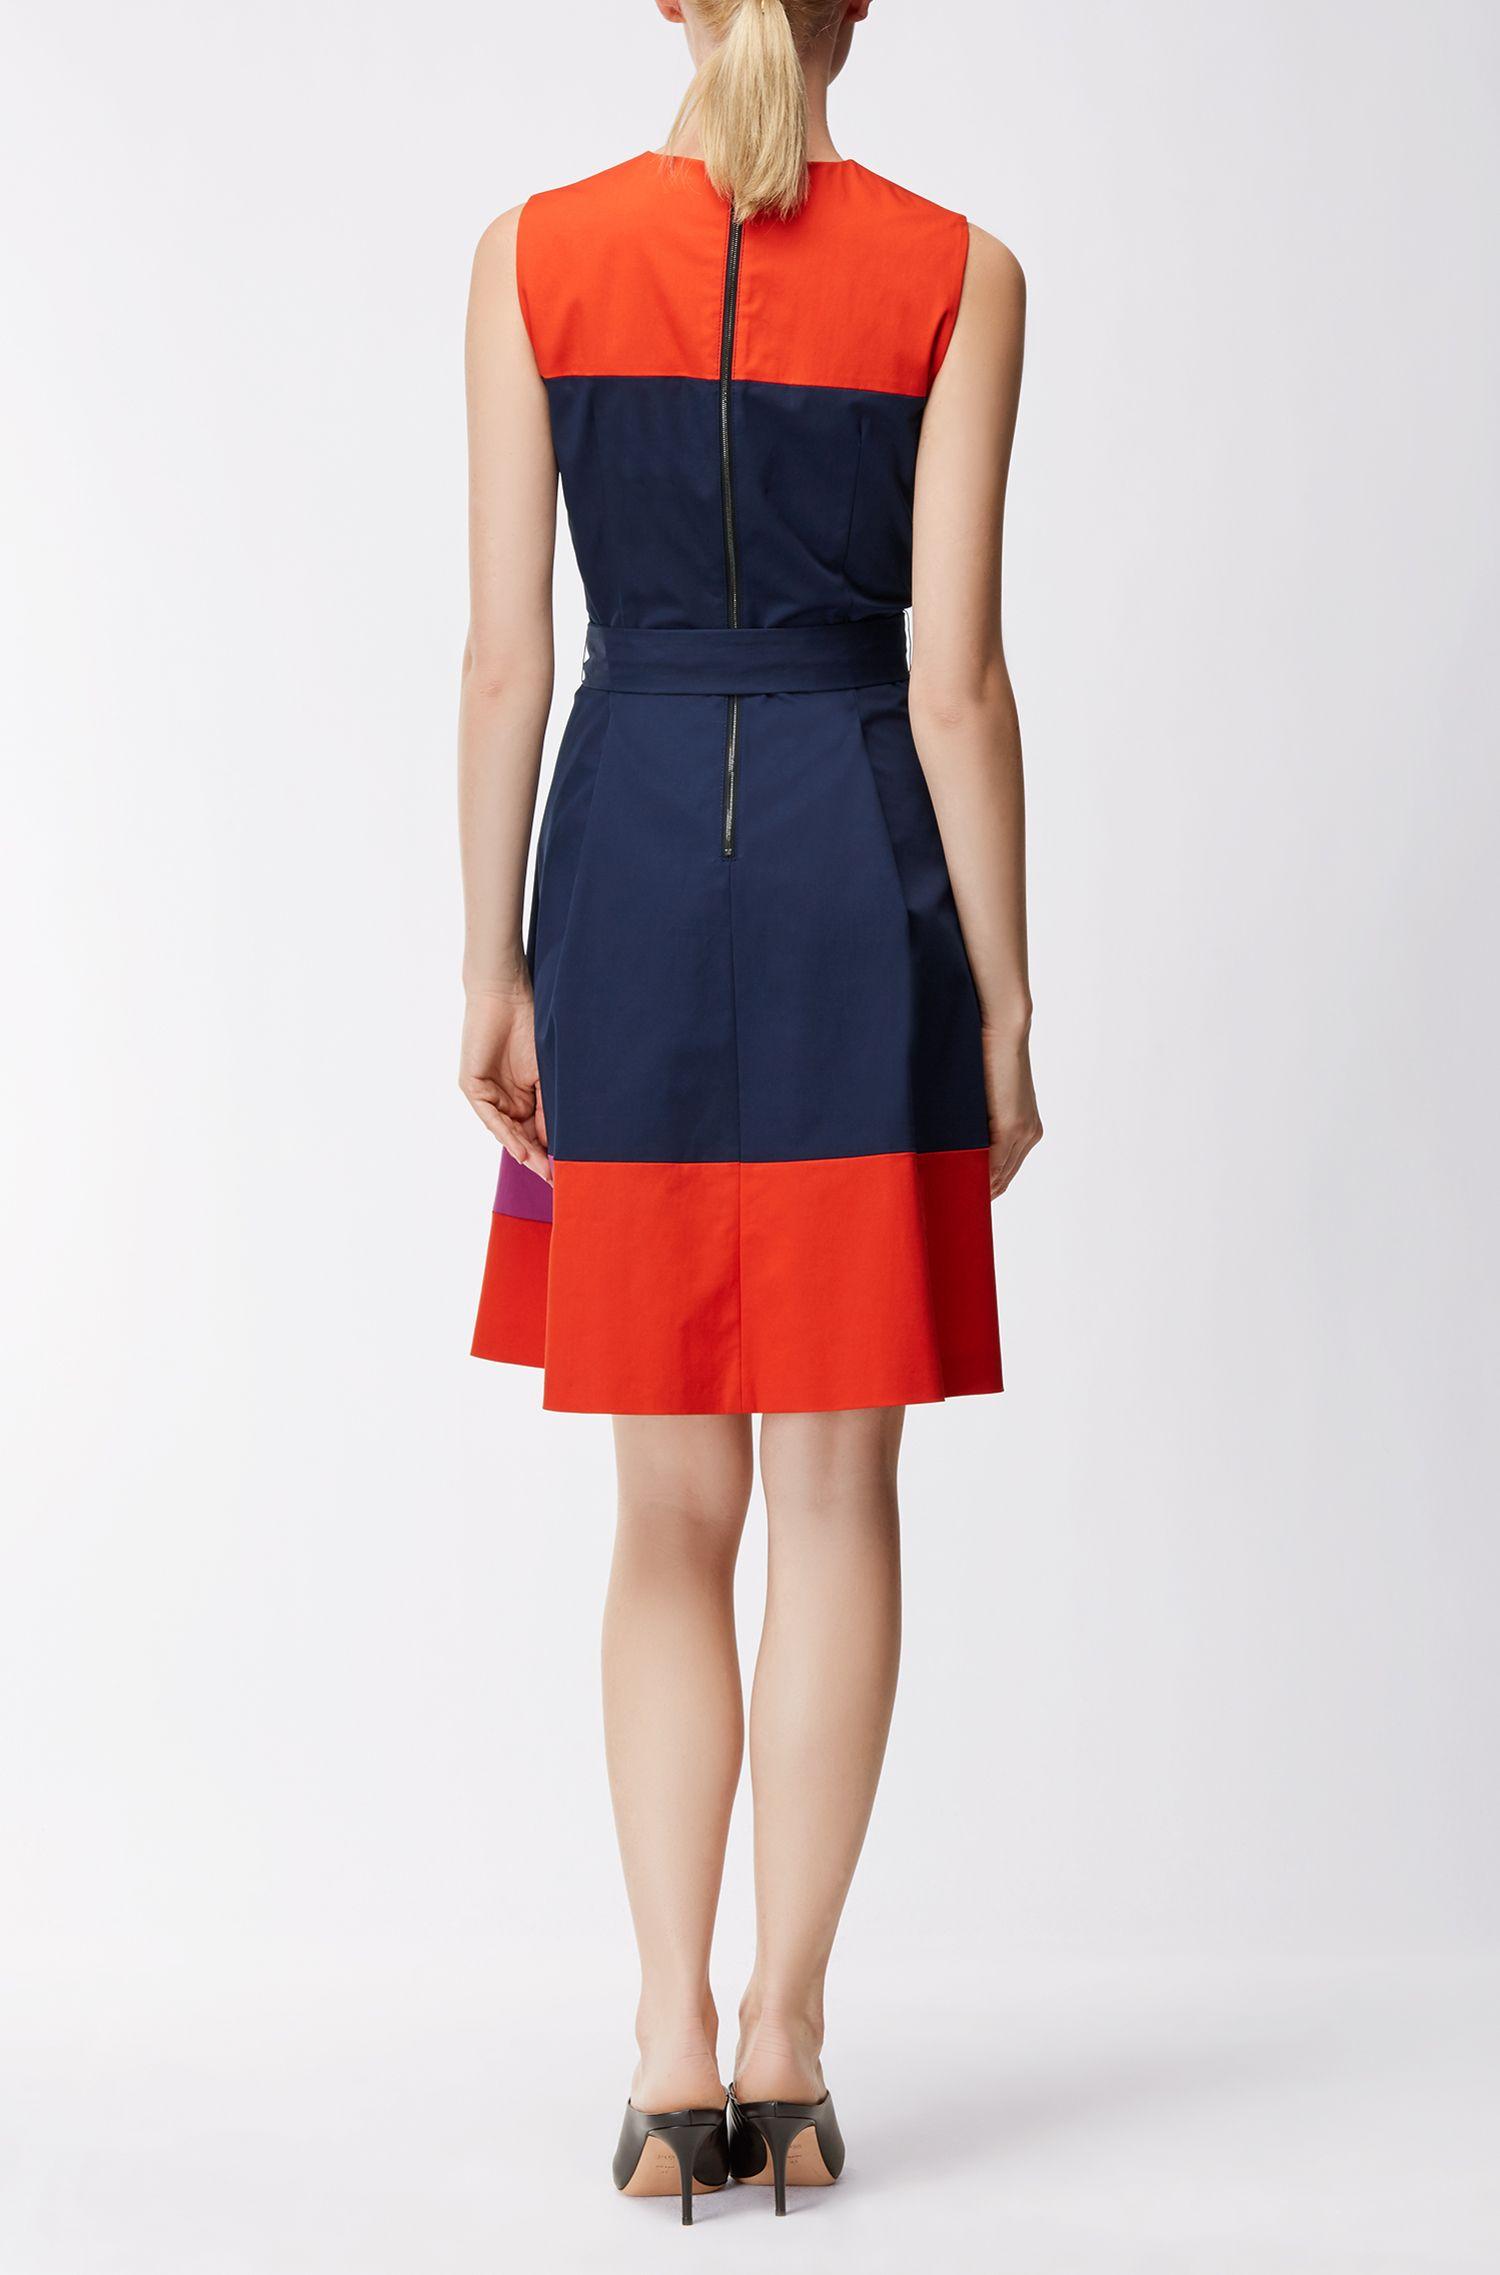 Colourblock mouwloze jurk van stretchkatoenen twill